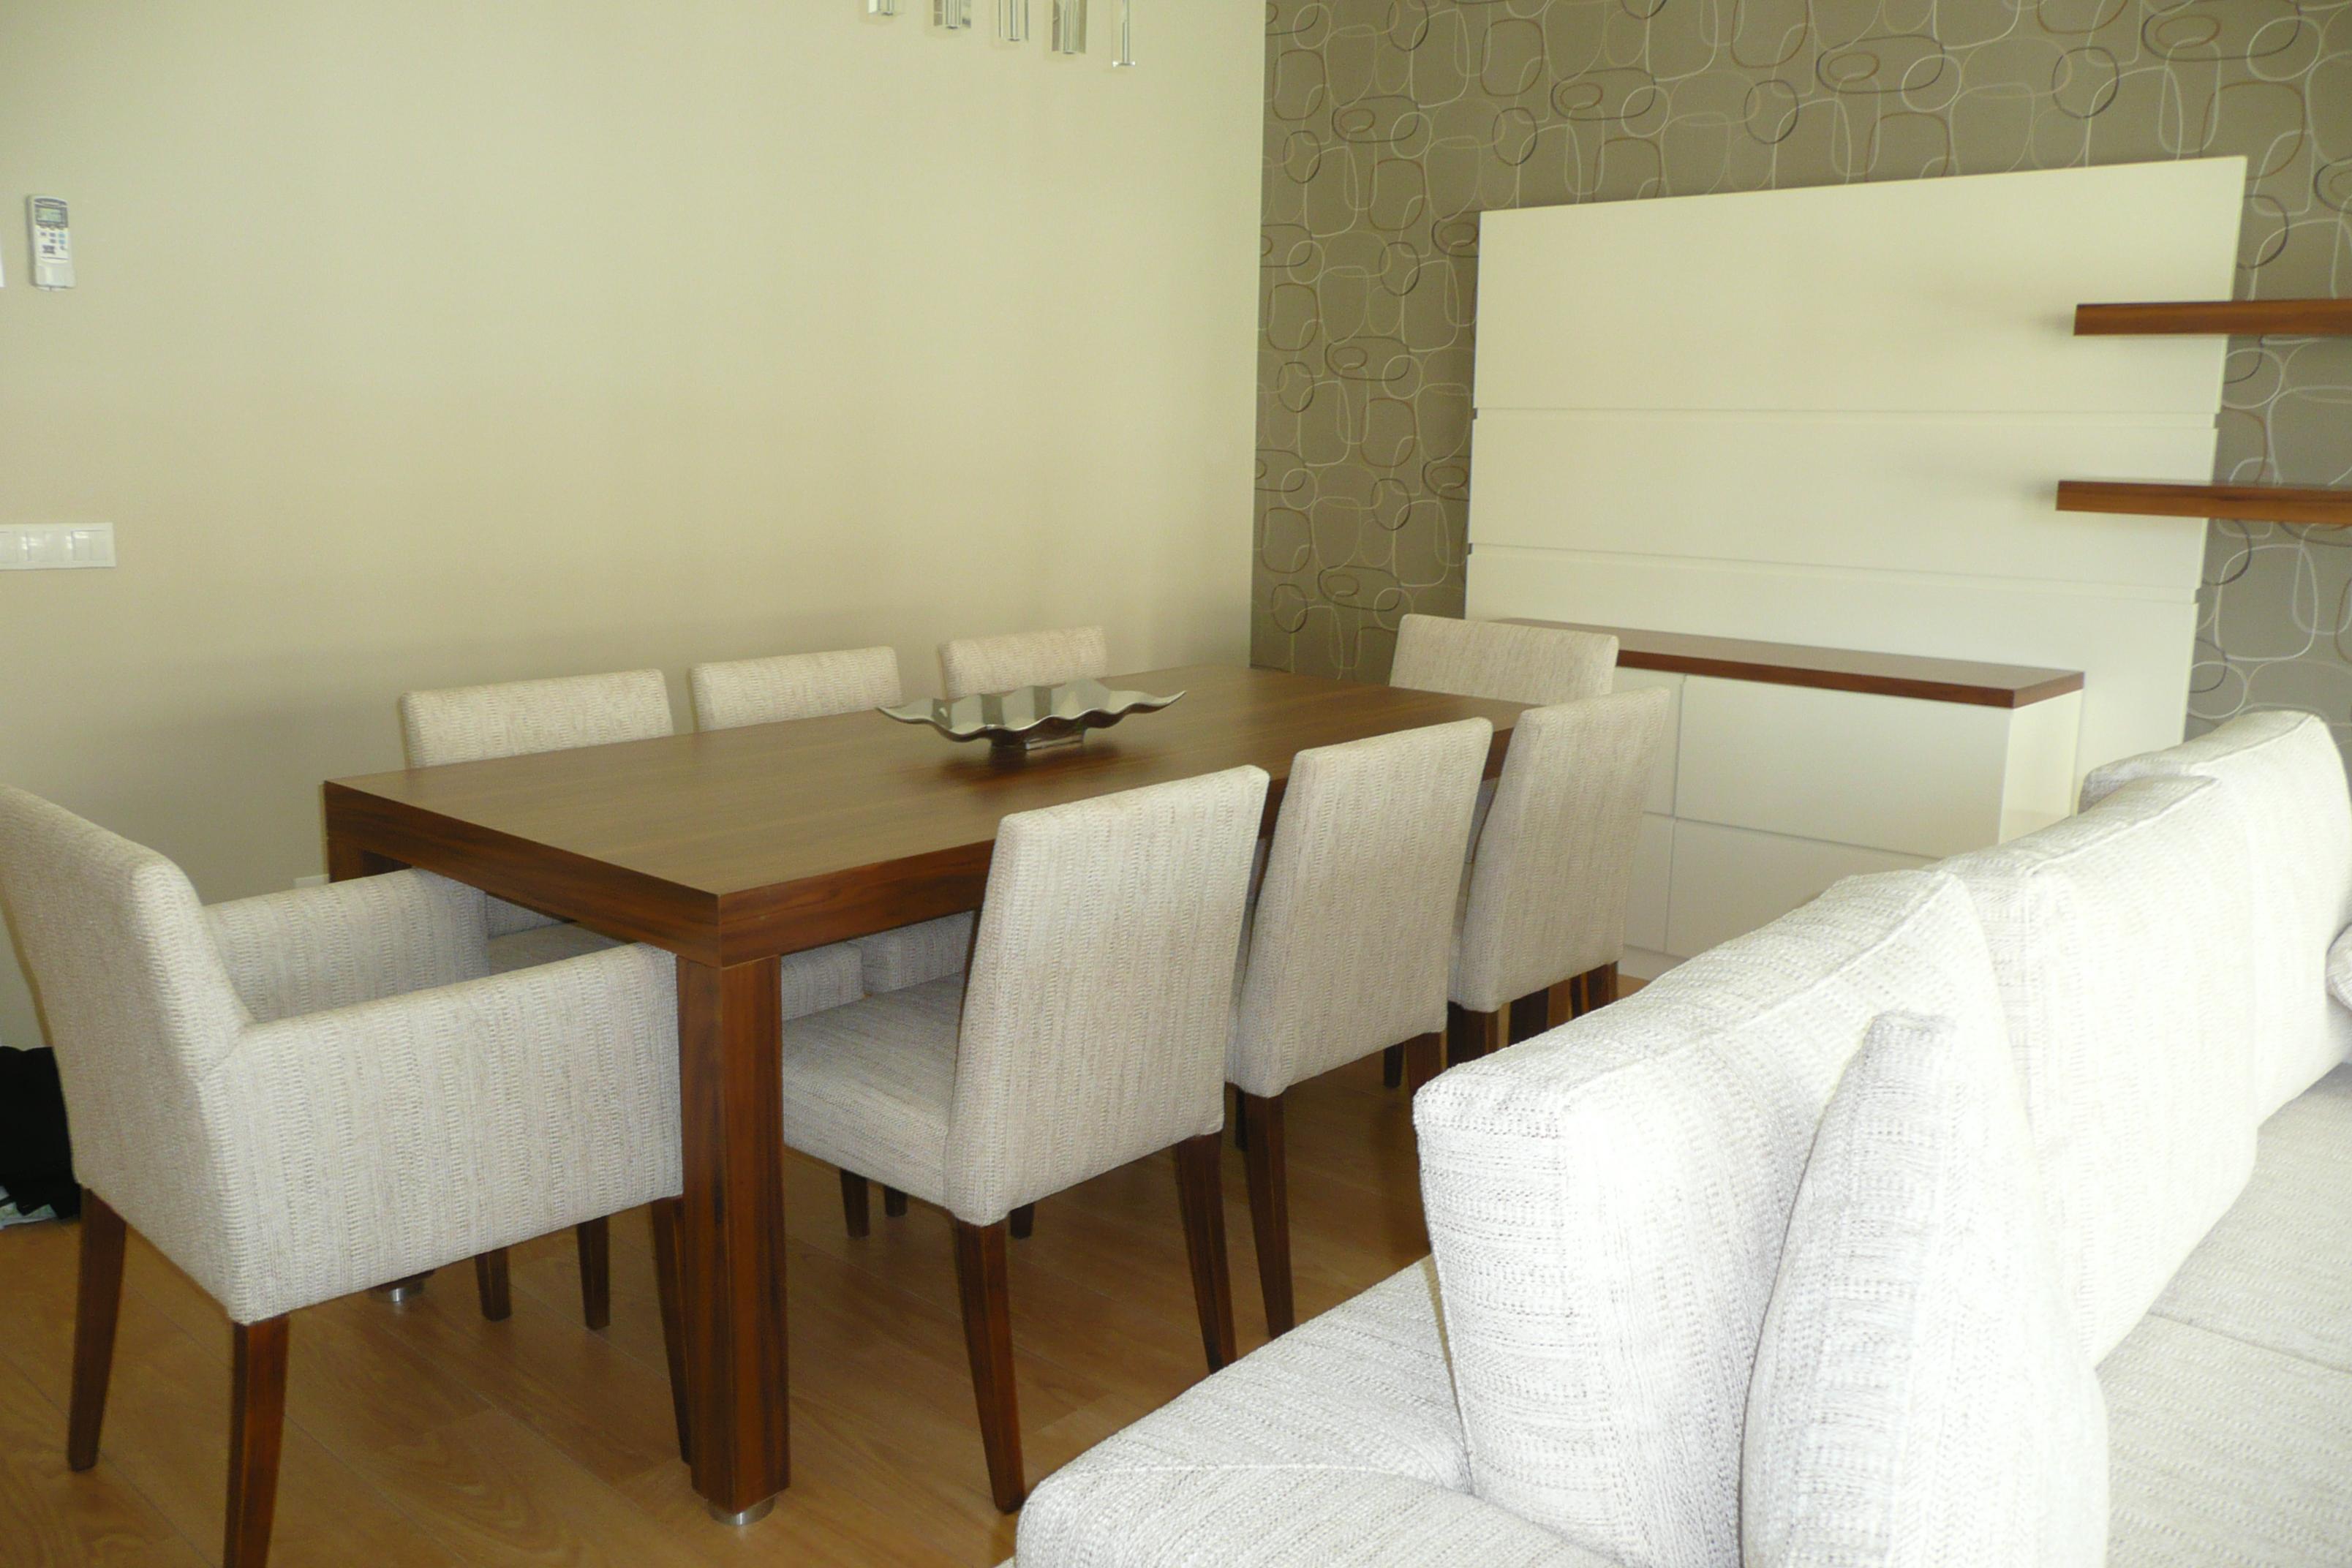 Sillas de comedor dise o 150 0 200 0 piezas mensual for Disenos de sillas para comedor